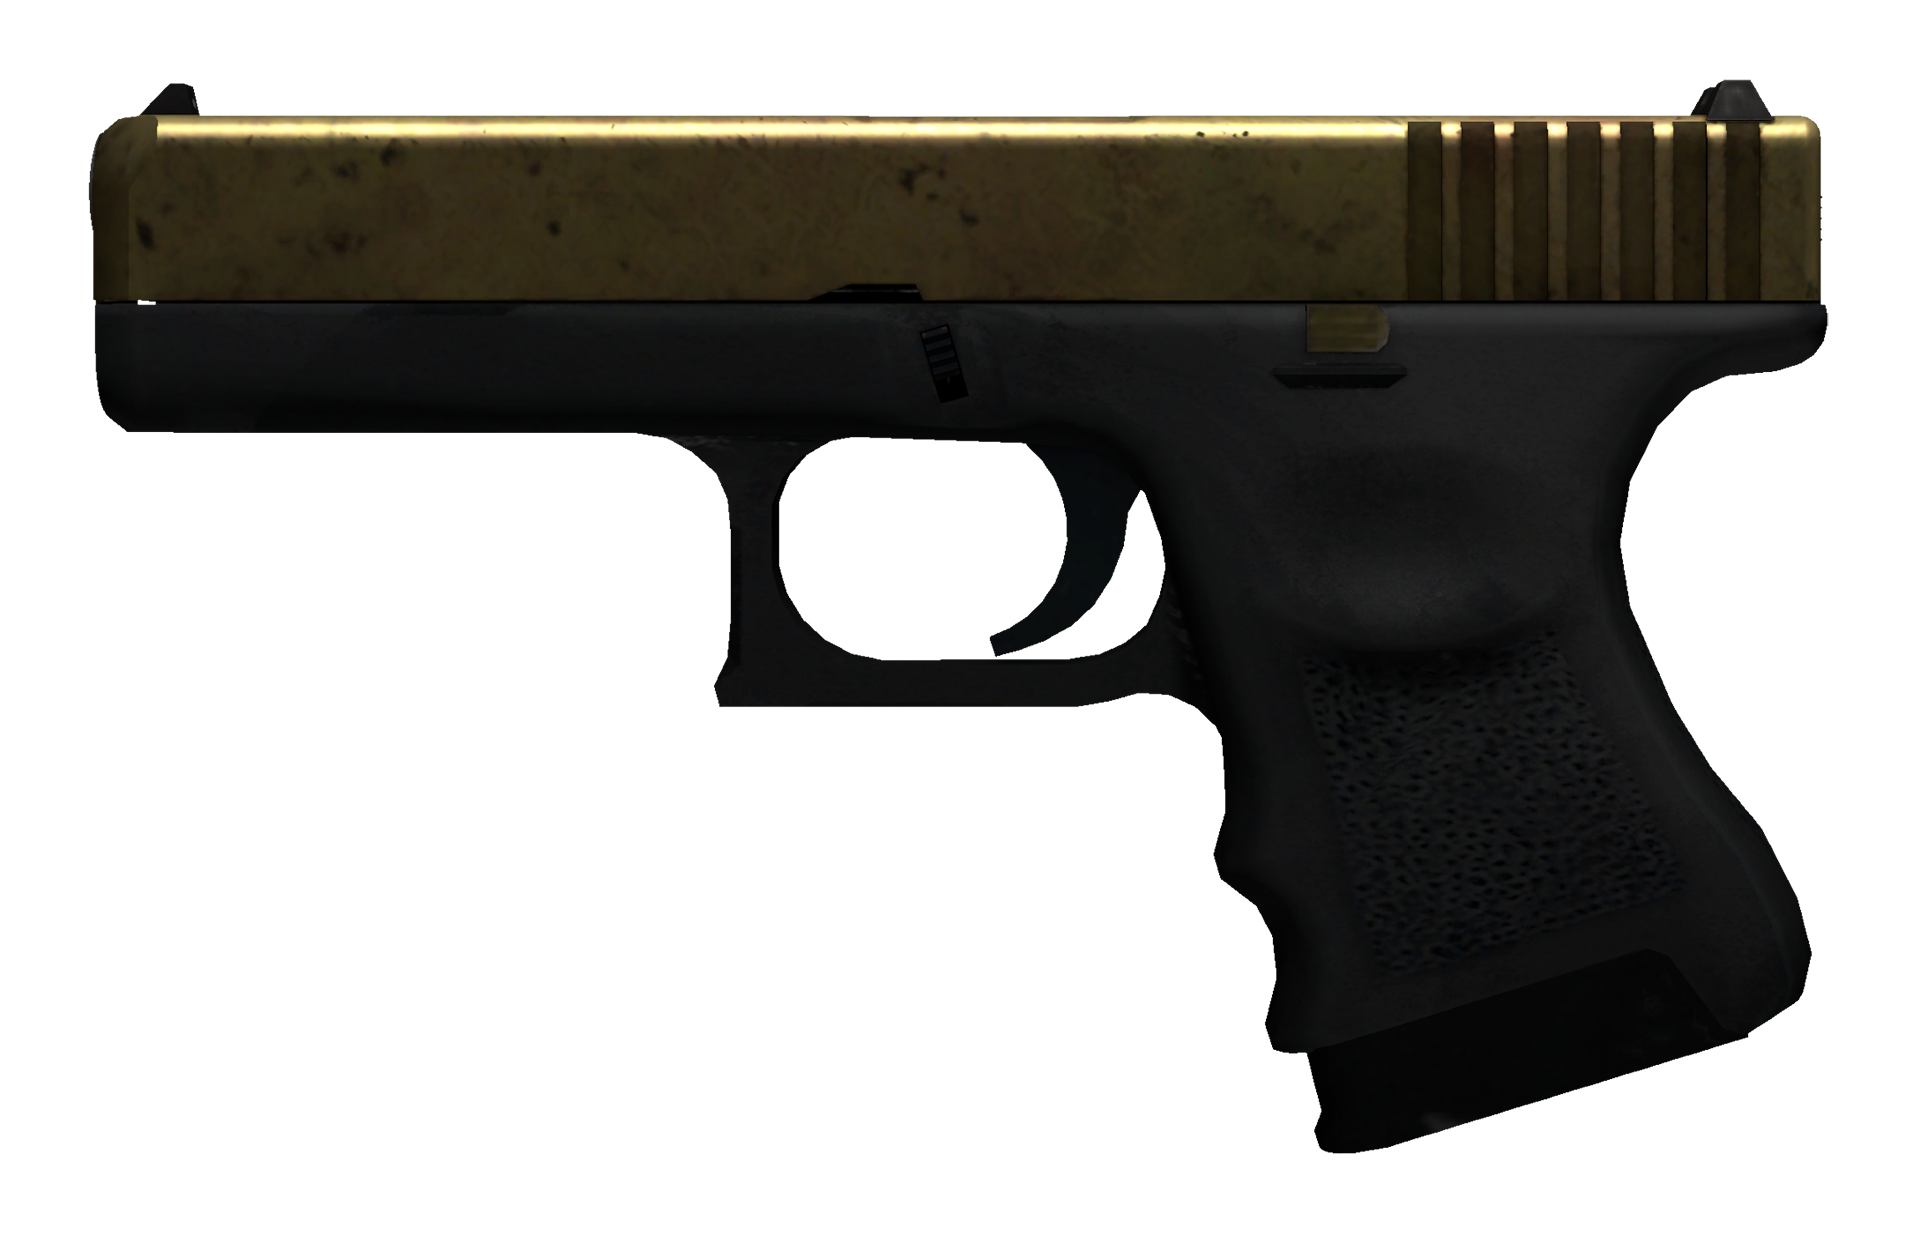 Glock-18 Brass Large Rendering